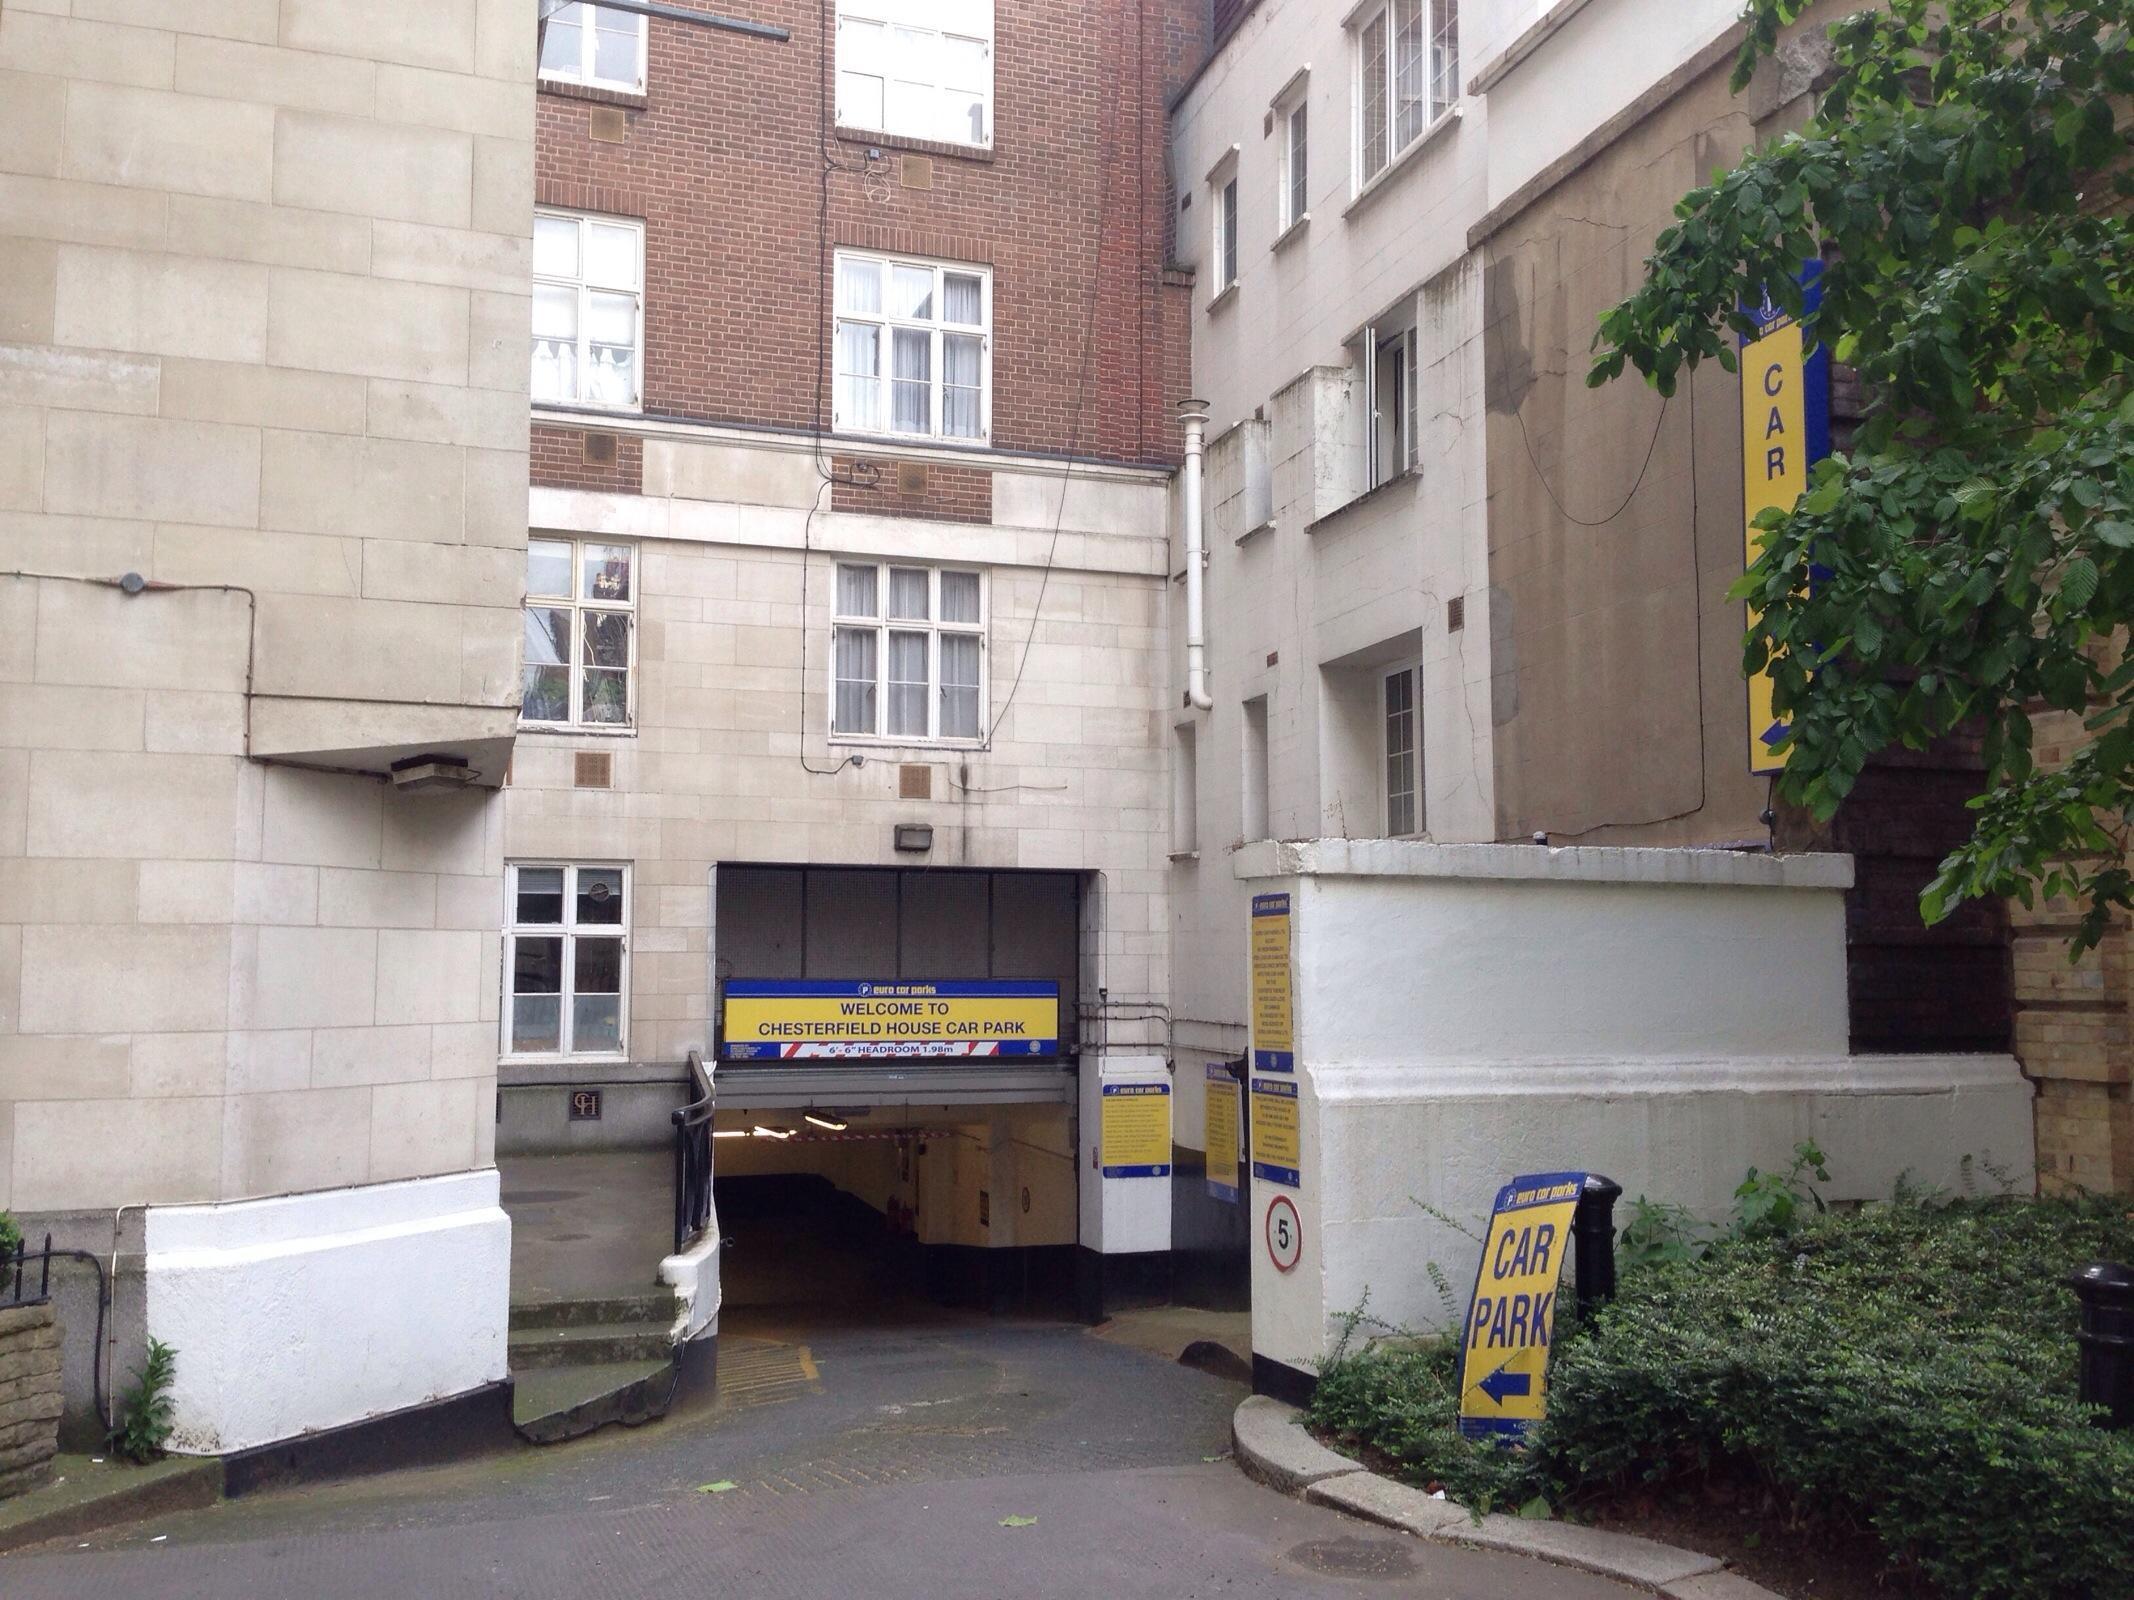 Chesterfield House Car Park Parking In London Parkme